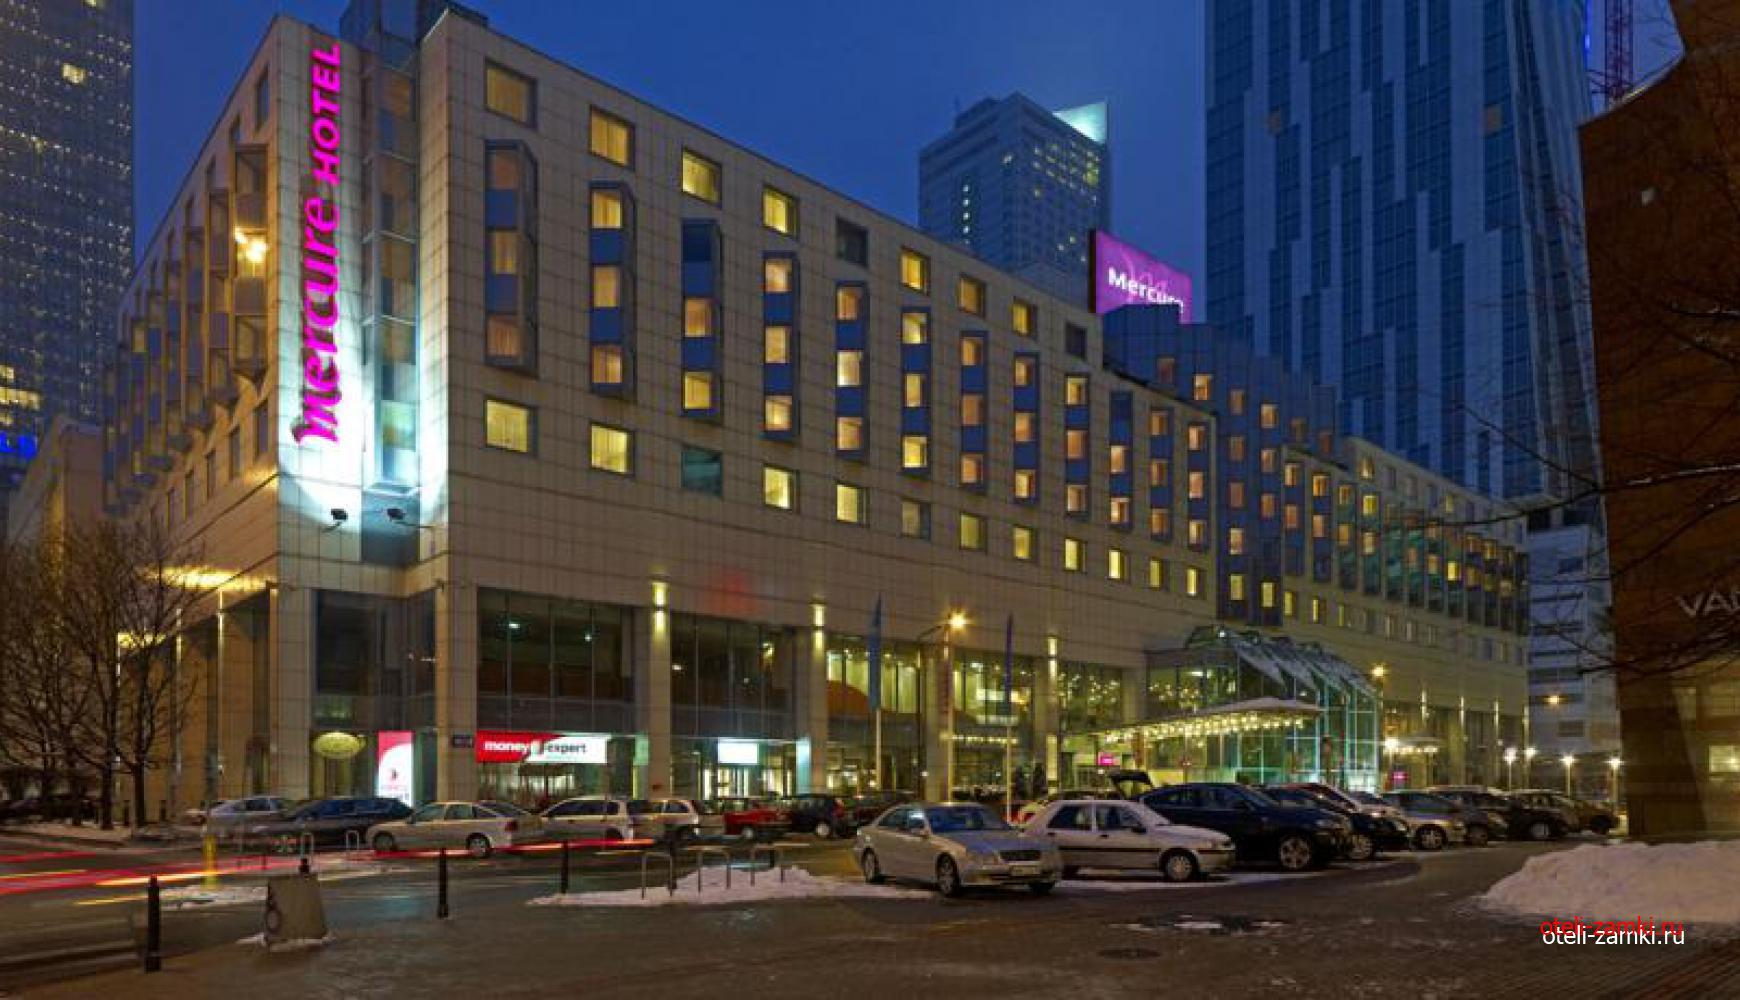 Mercure Warszawa Centrum 4* (Польша, Варшава)